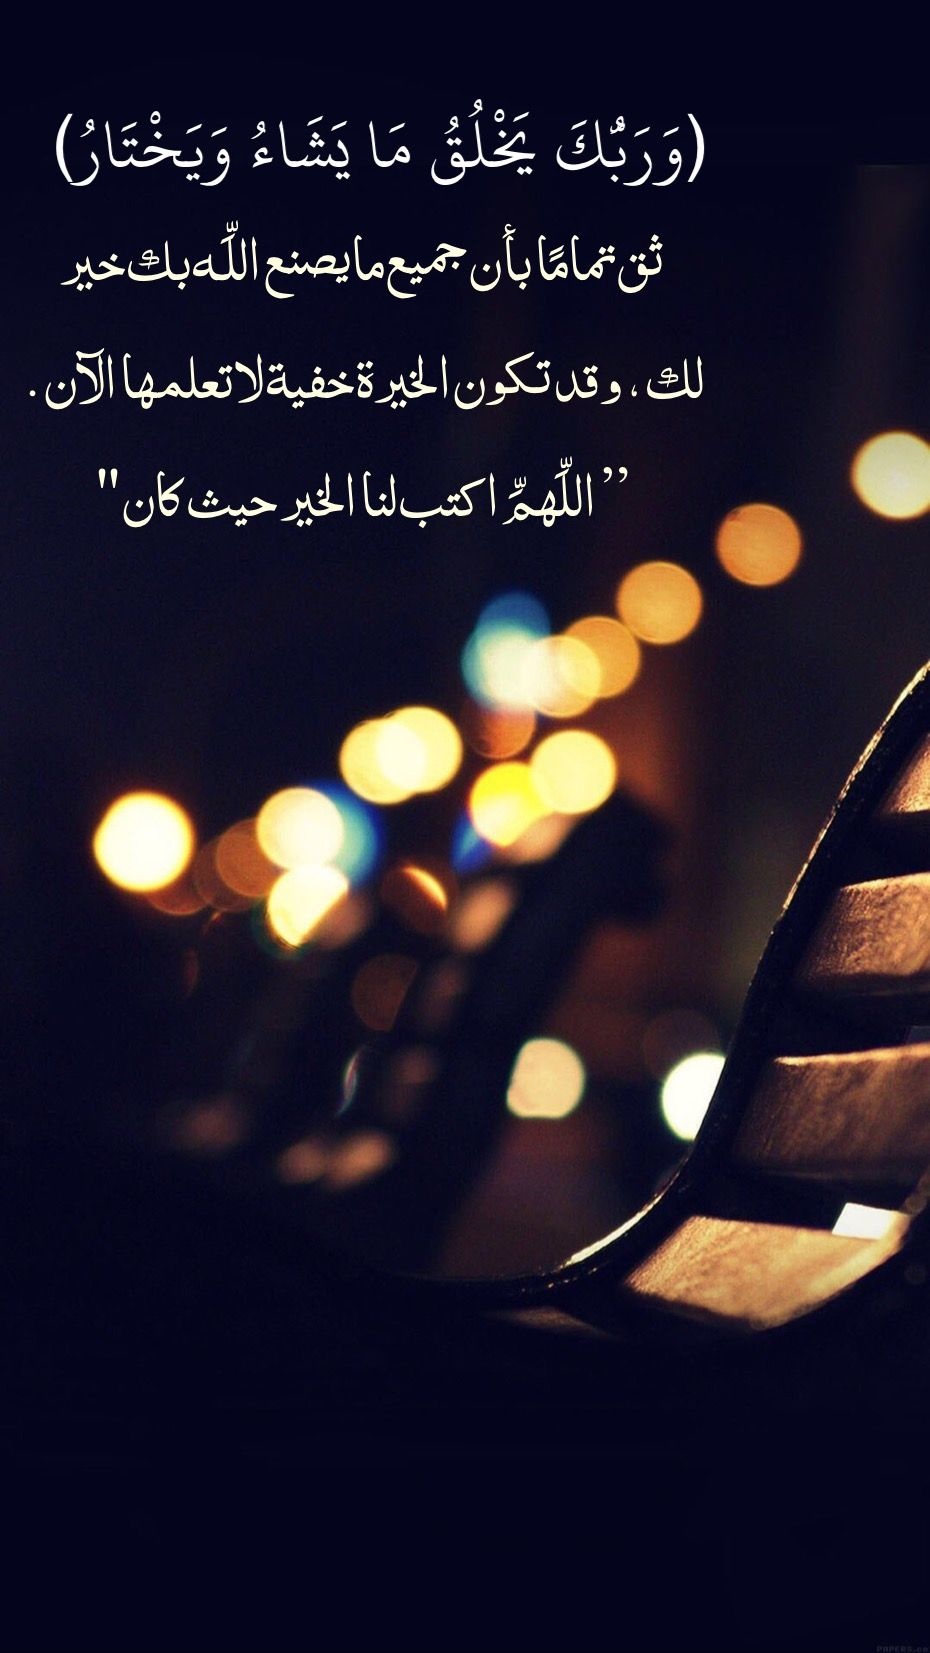 Pin By Ahmed Samir On خلفيات دينية Islam Marriage Quran Verses Islamic Pictures